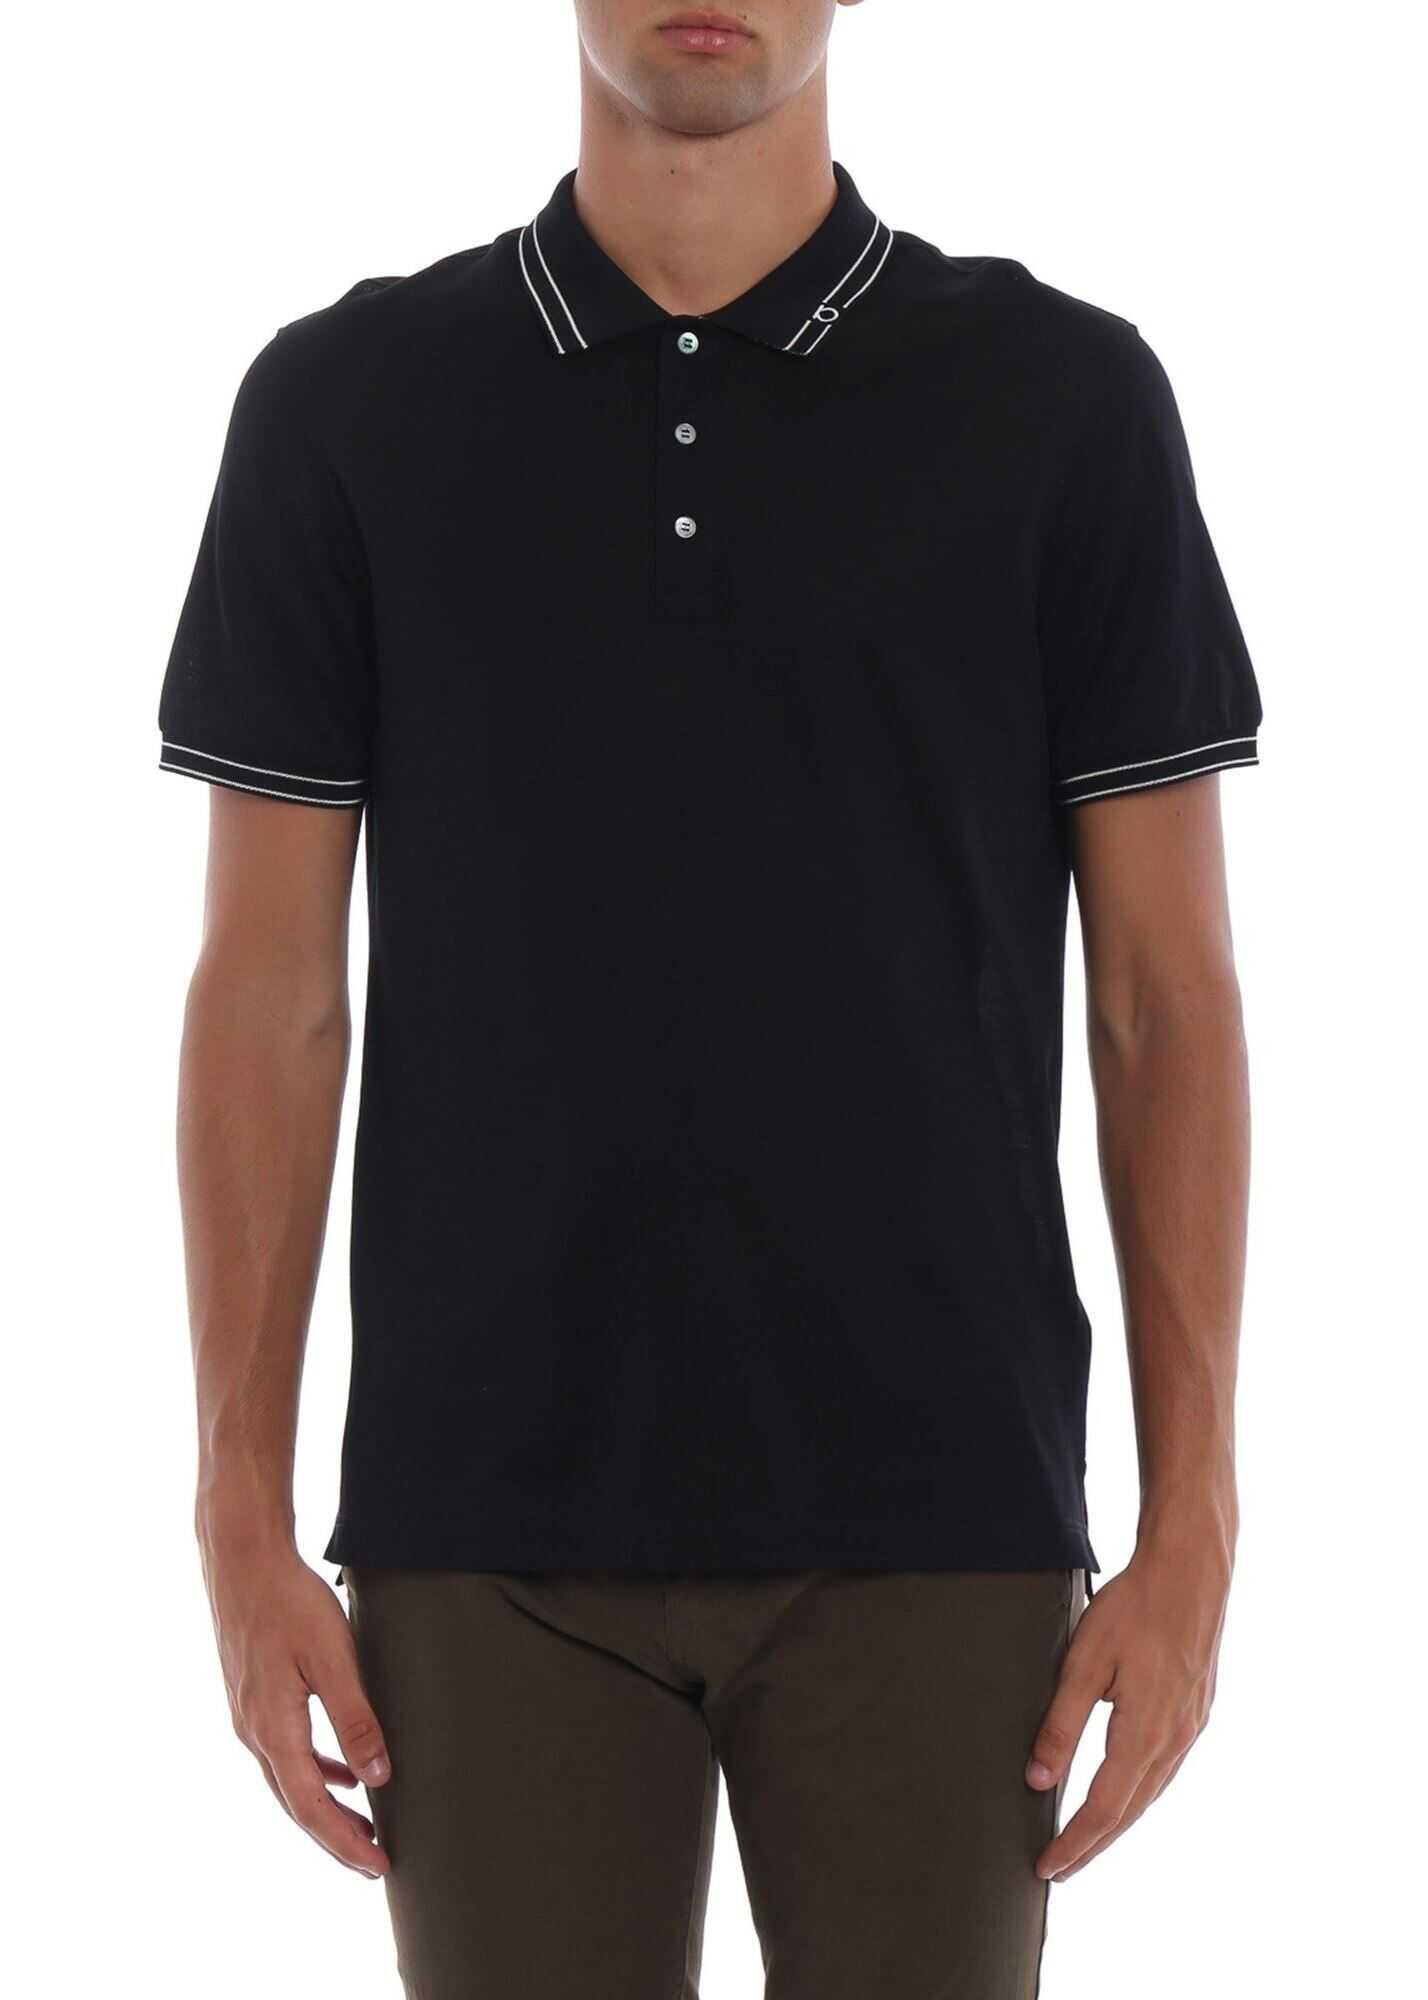 Salvatore Ferragamo Gancio Embroidery Cotton Pique Polo Shirt Blue